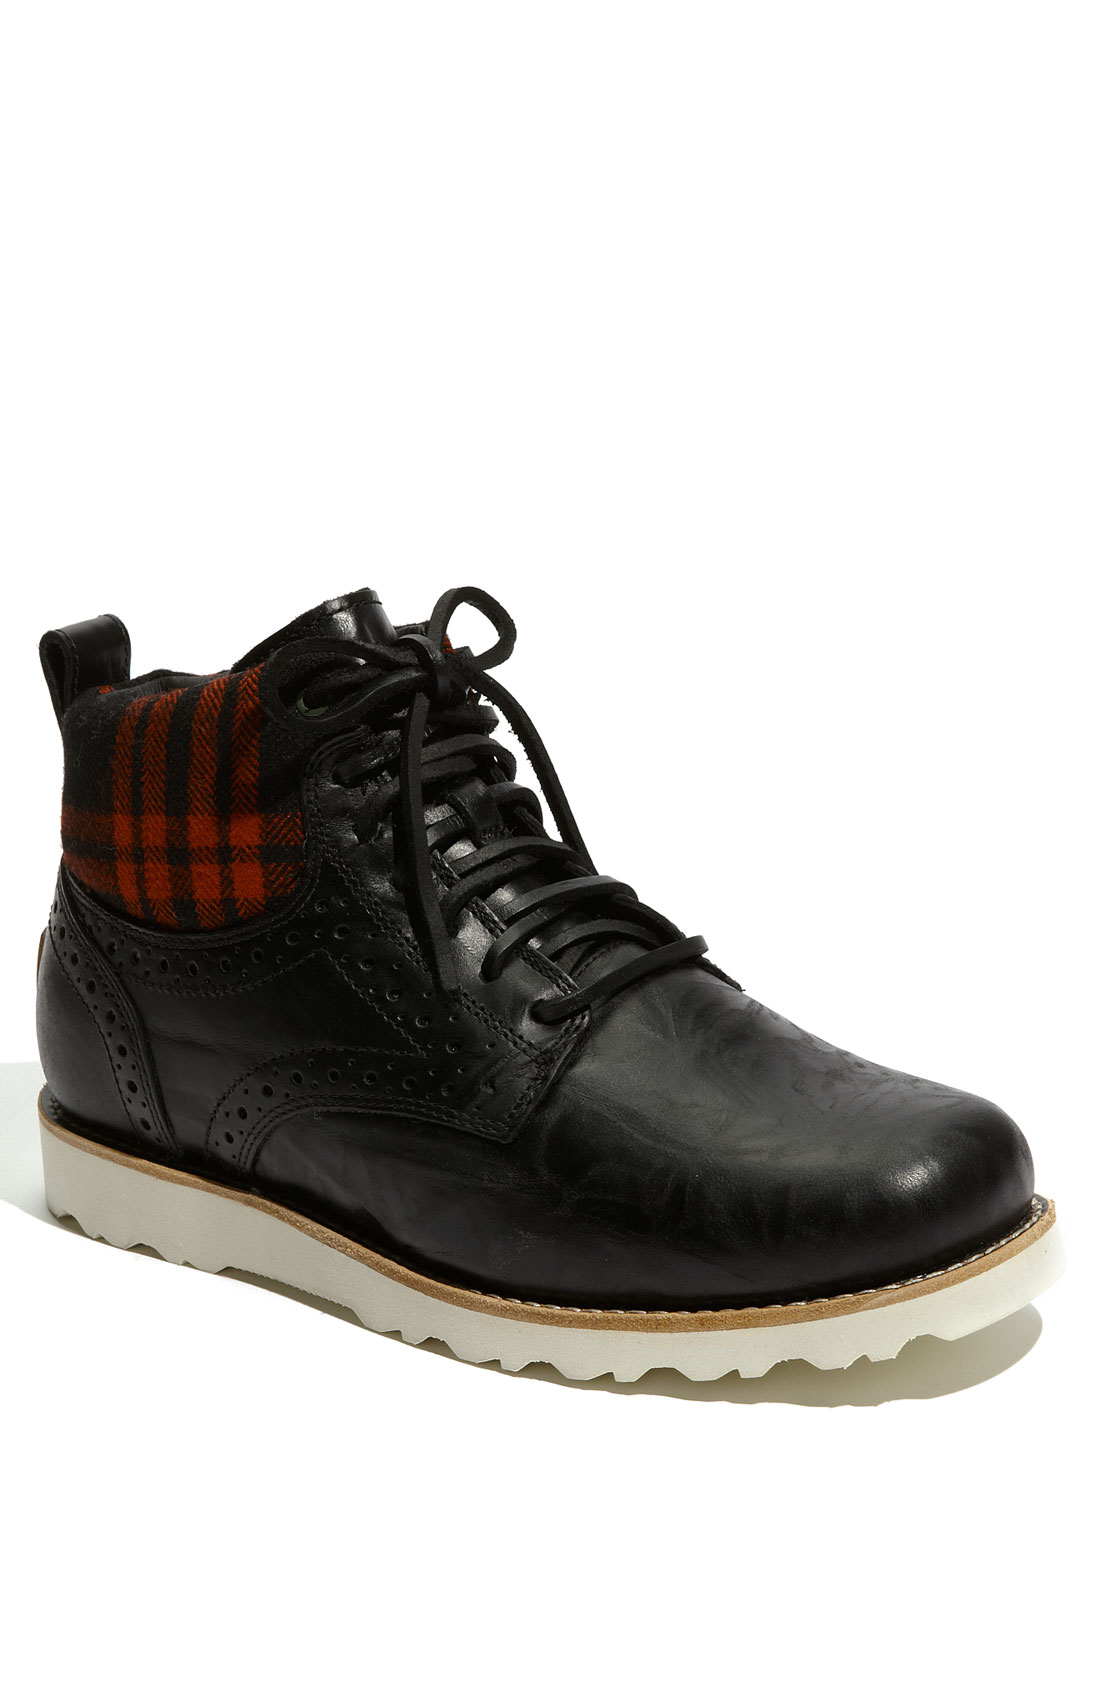 ugg sullivan chukka boot in black for lyst